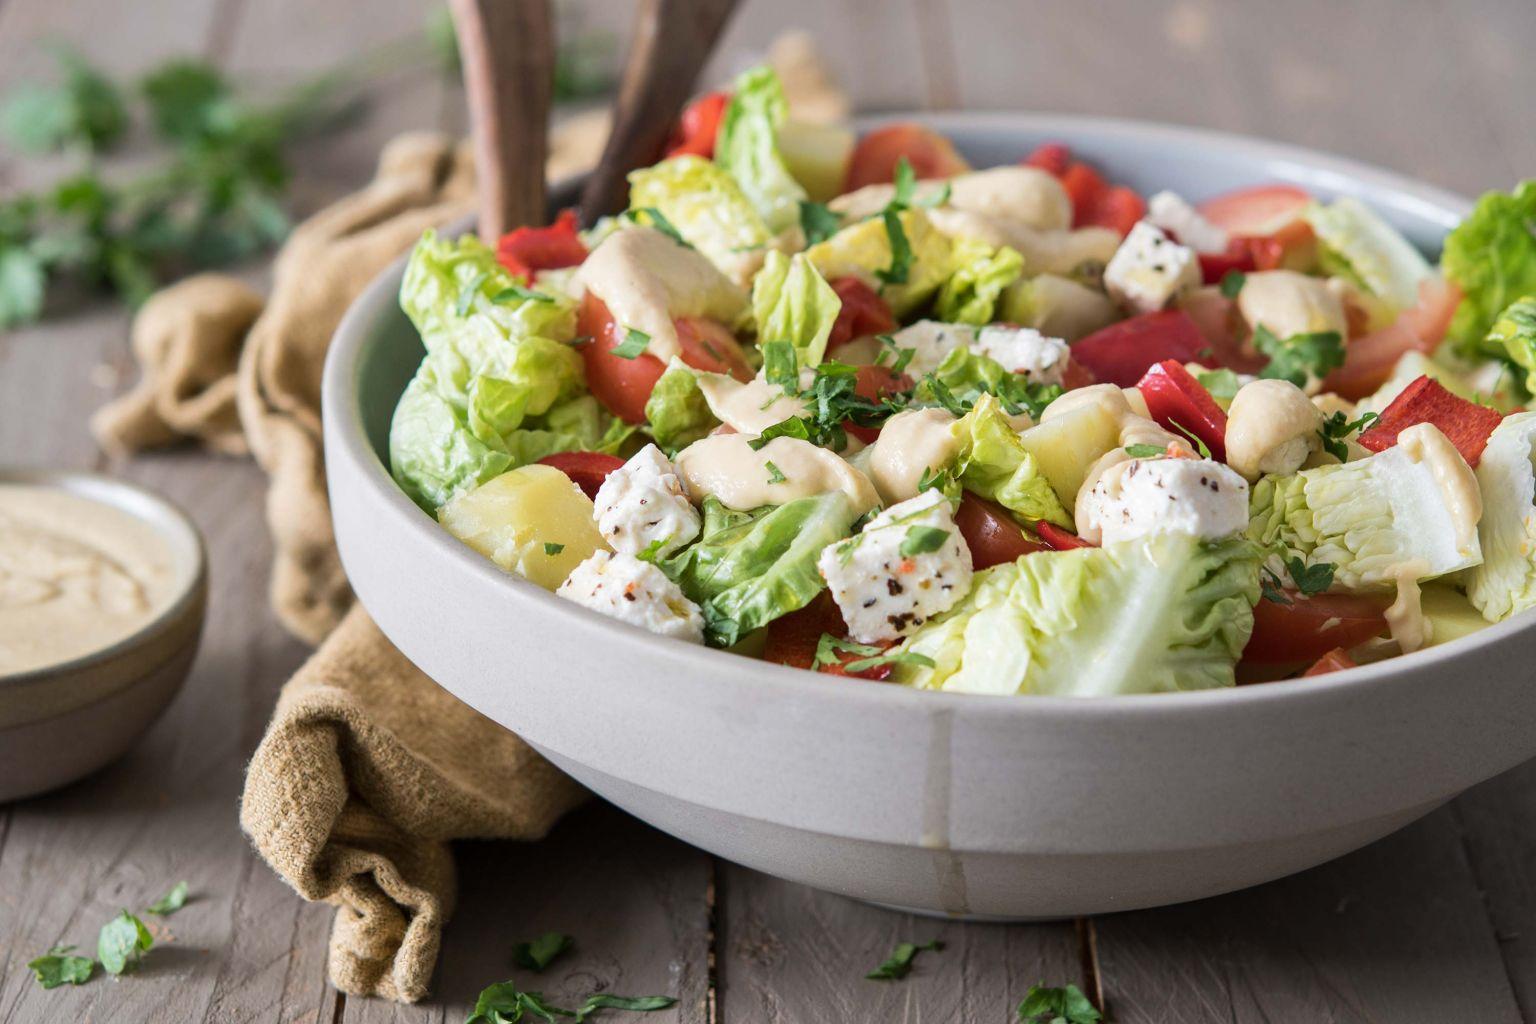 Salade au poivron, houmous et féta